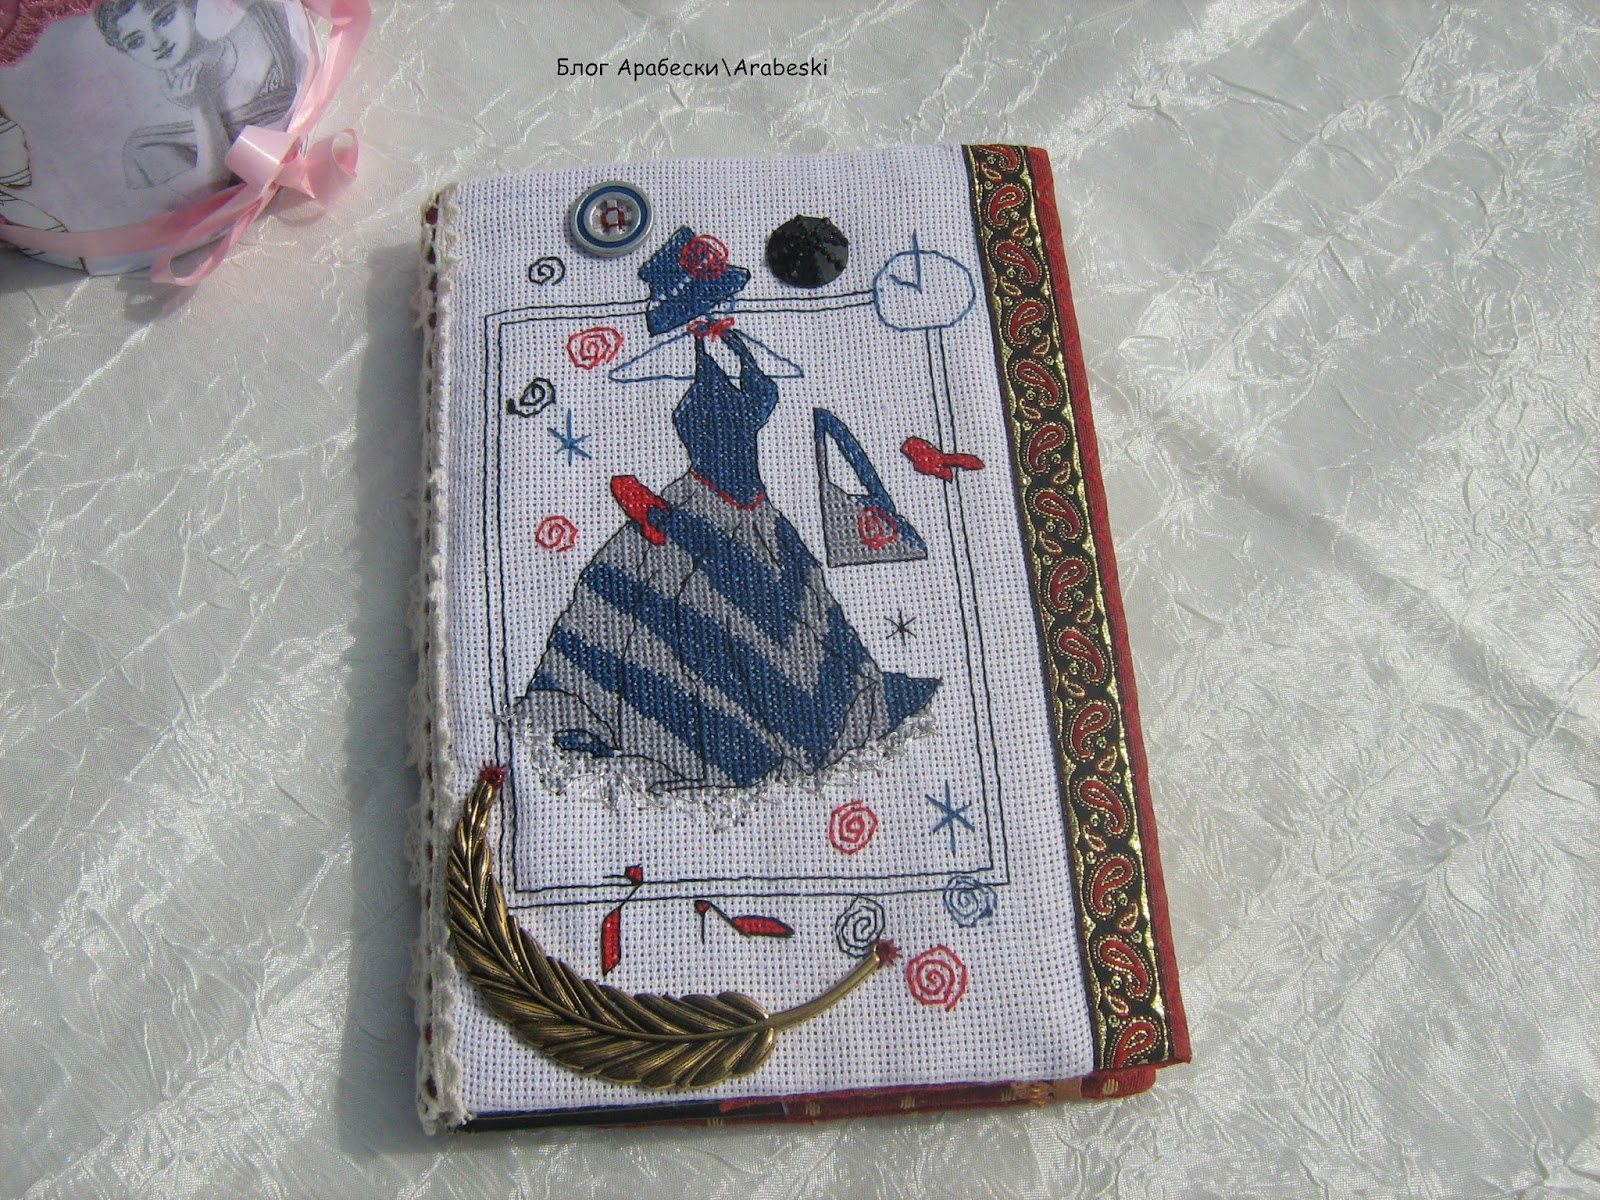 Вышивка обложка на ежедневник